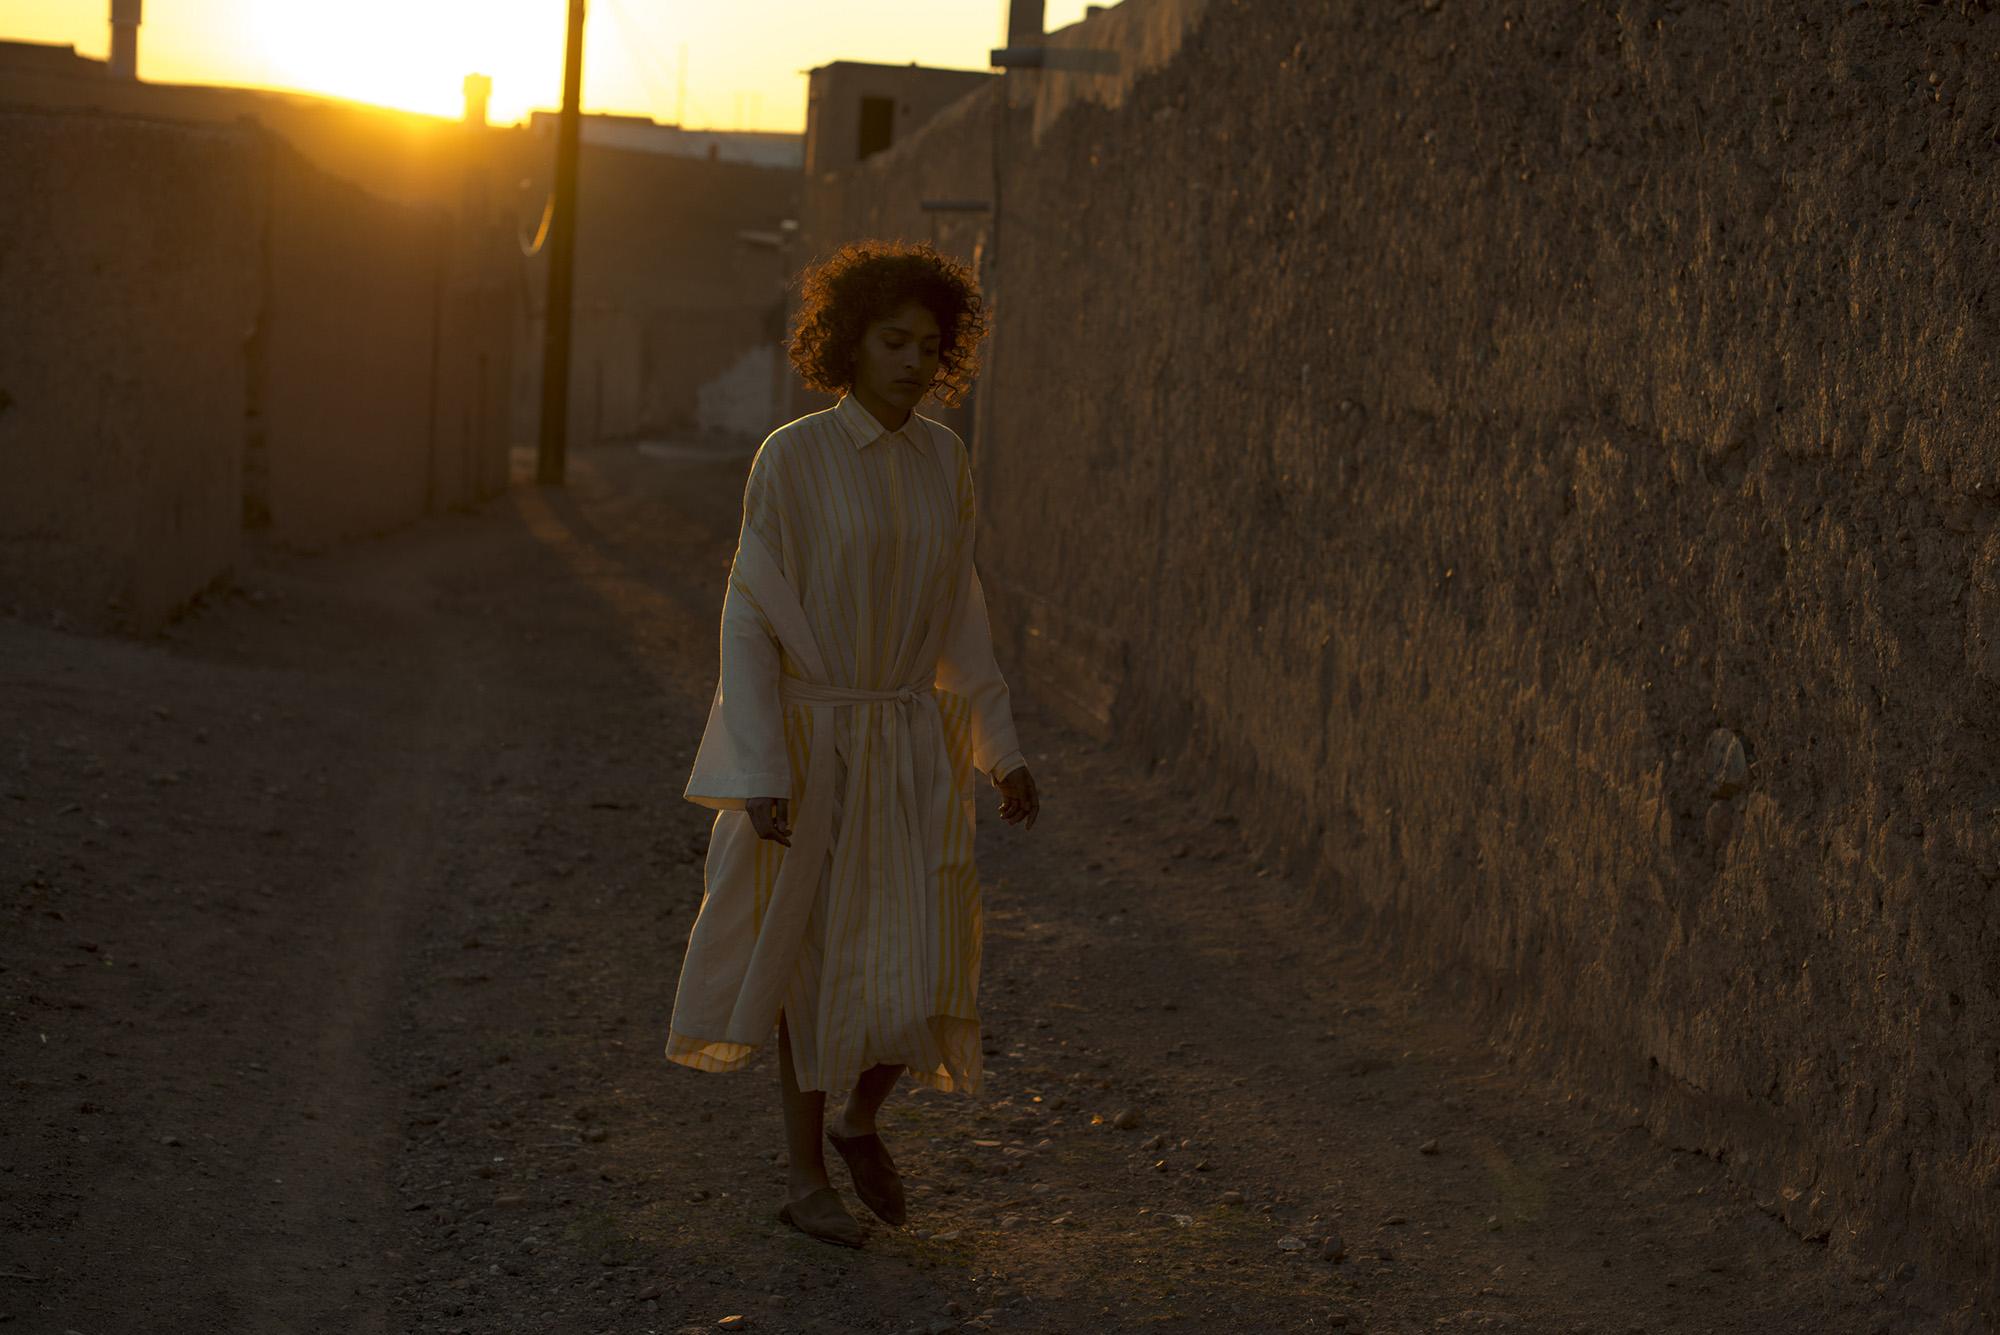 Maroc_theLissome22_web.jpg